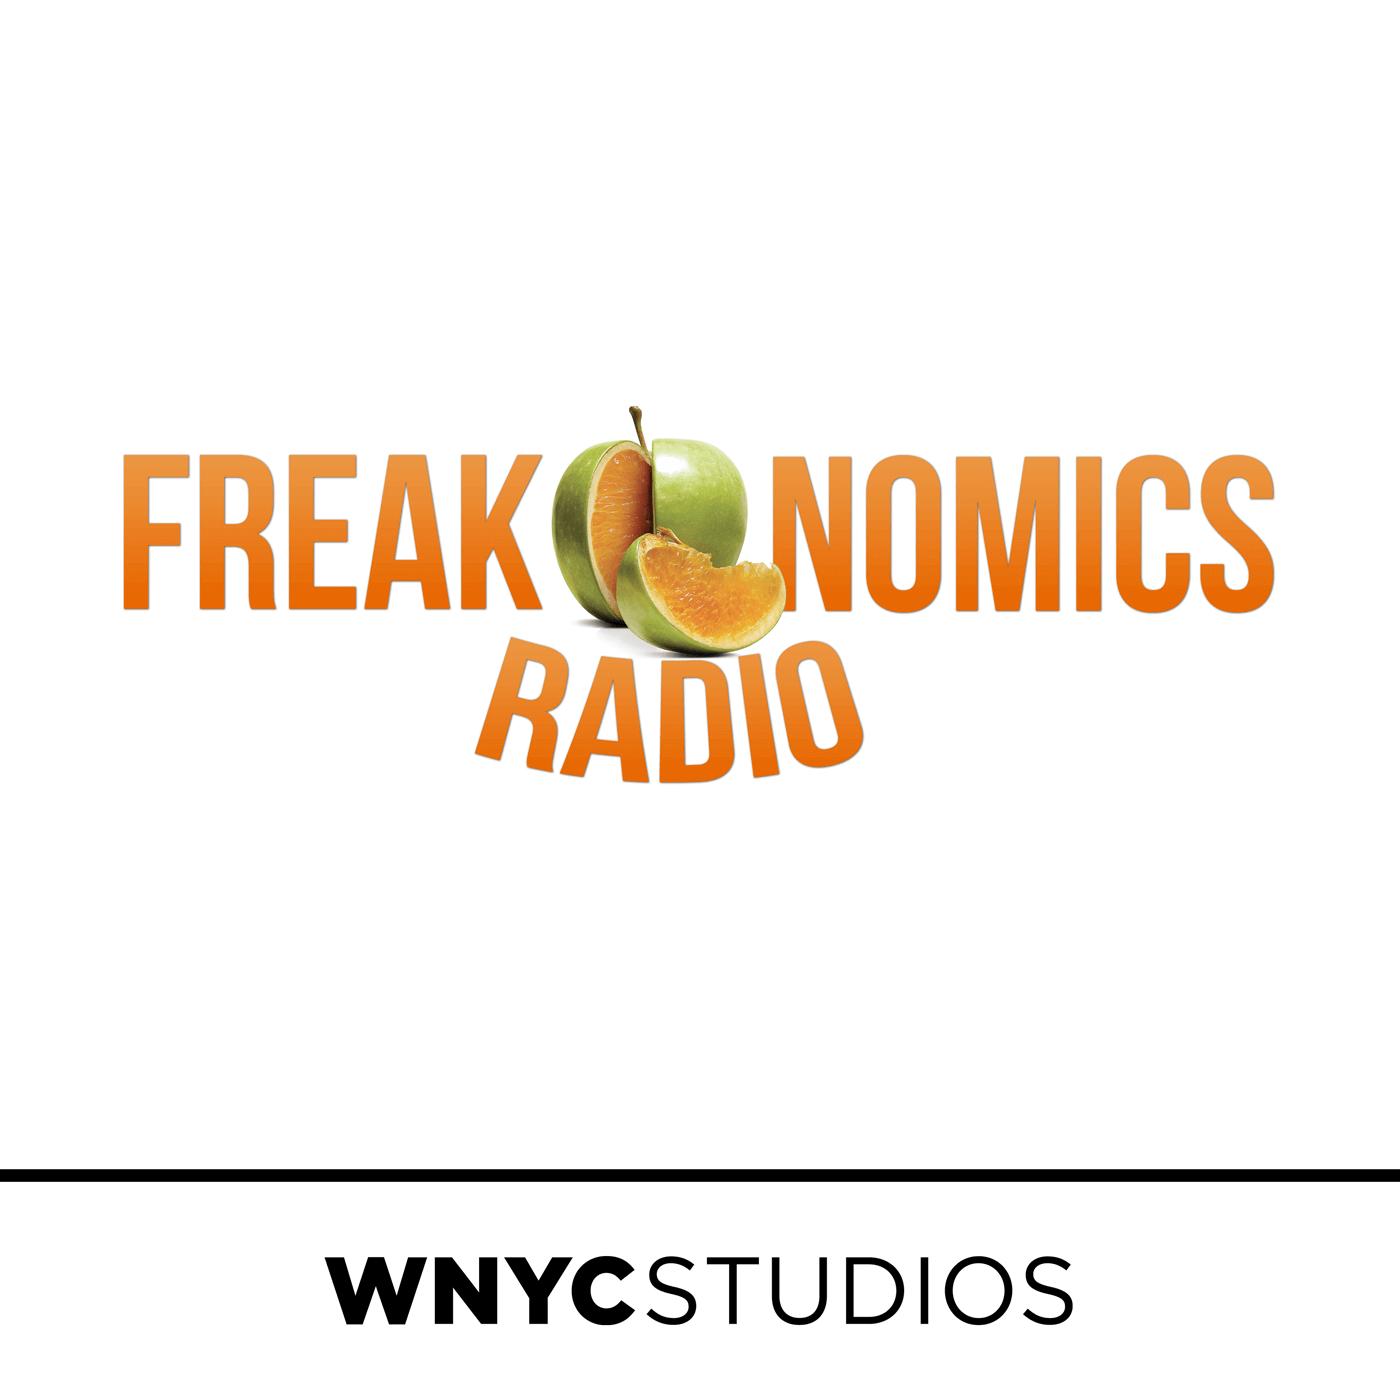 Freakonomics Radio NPR